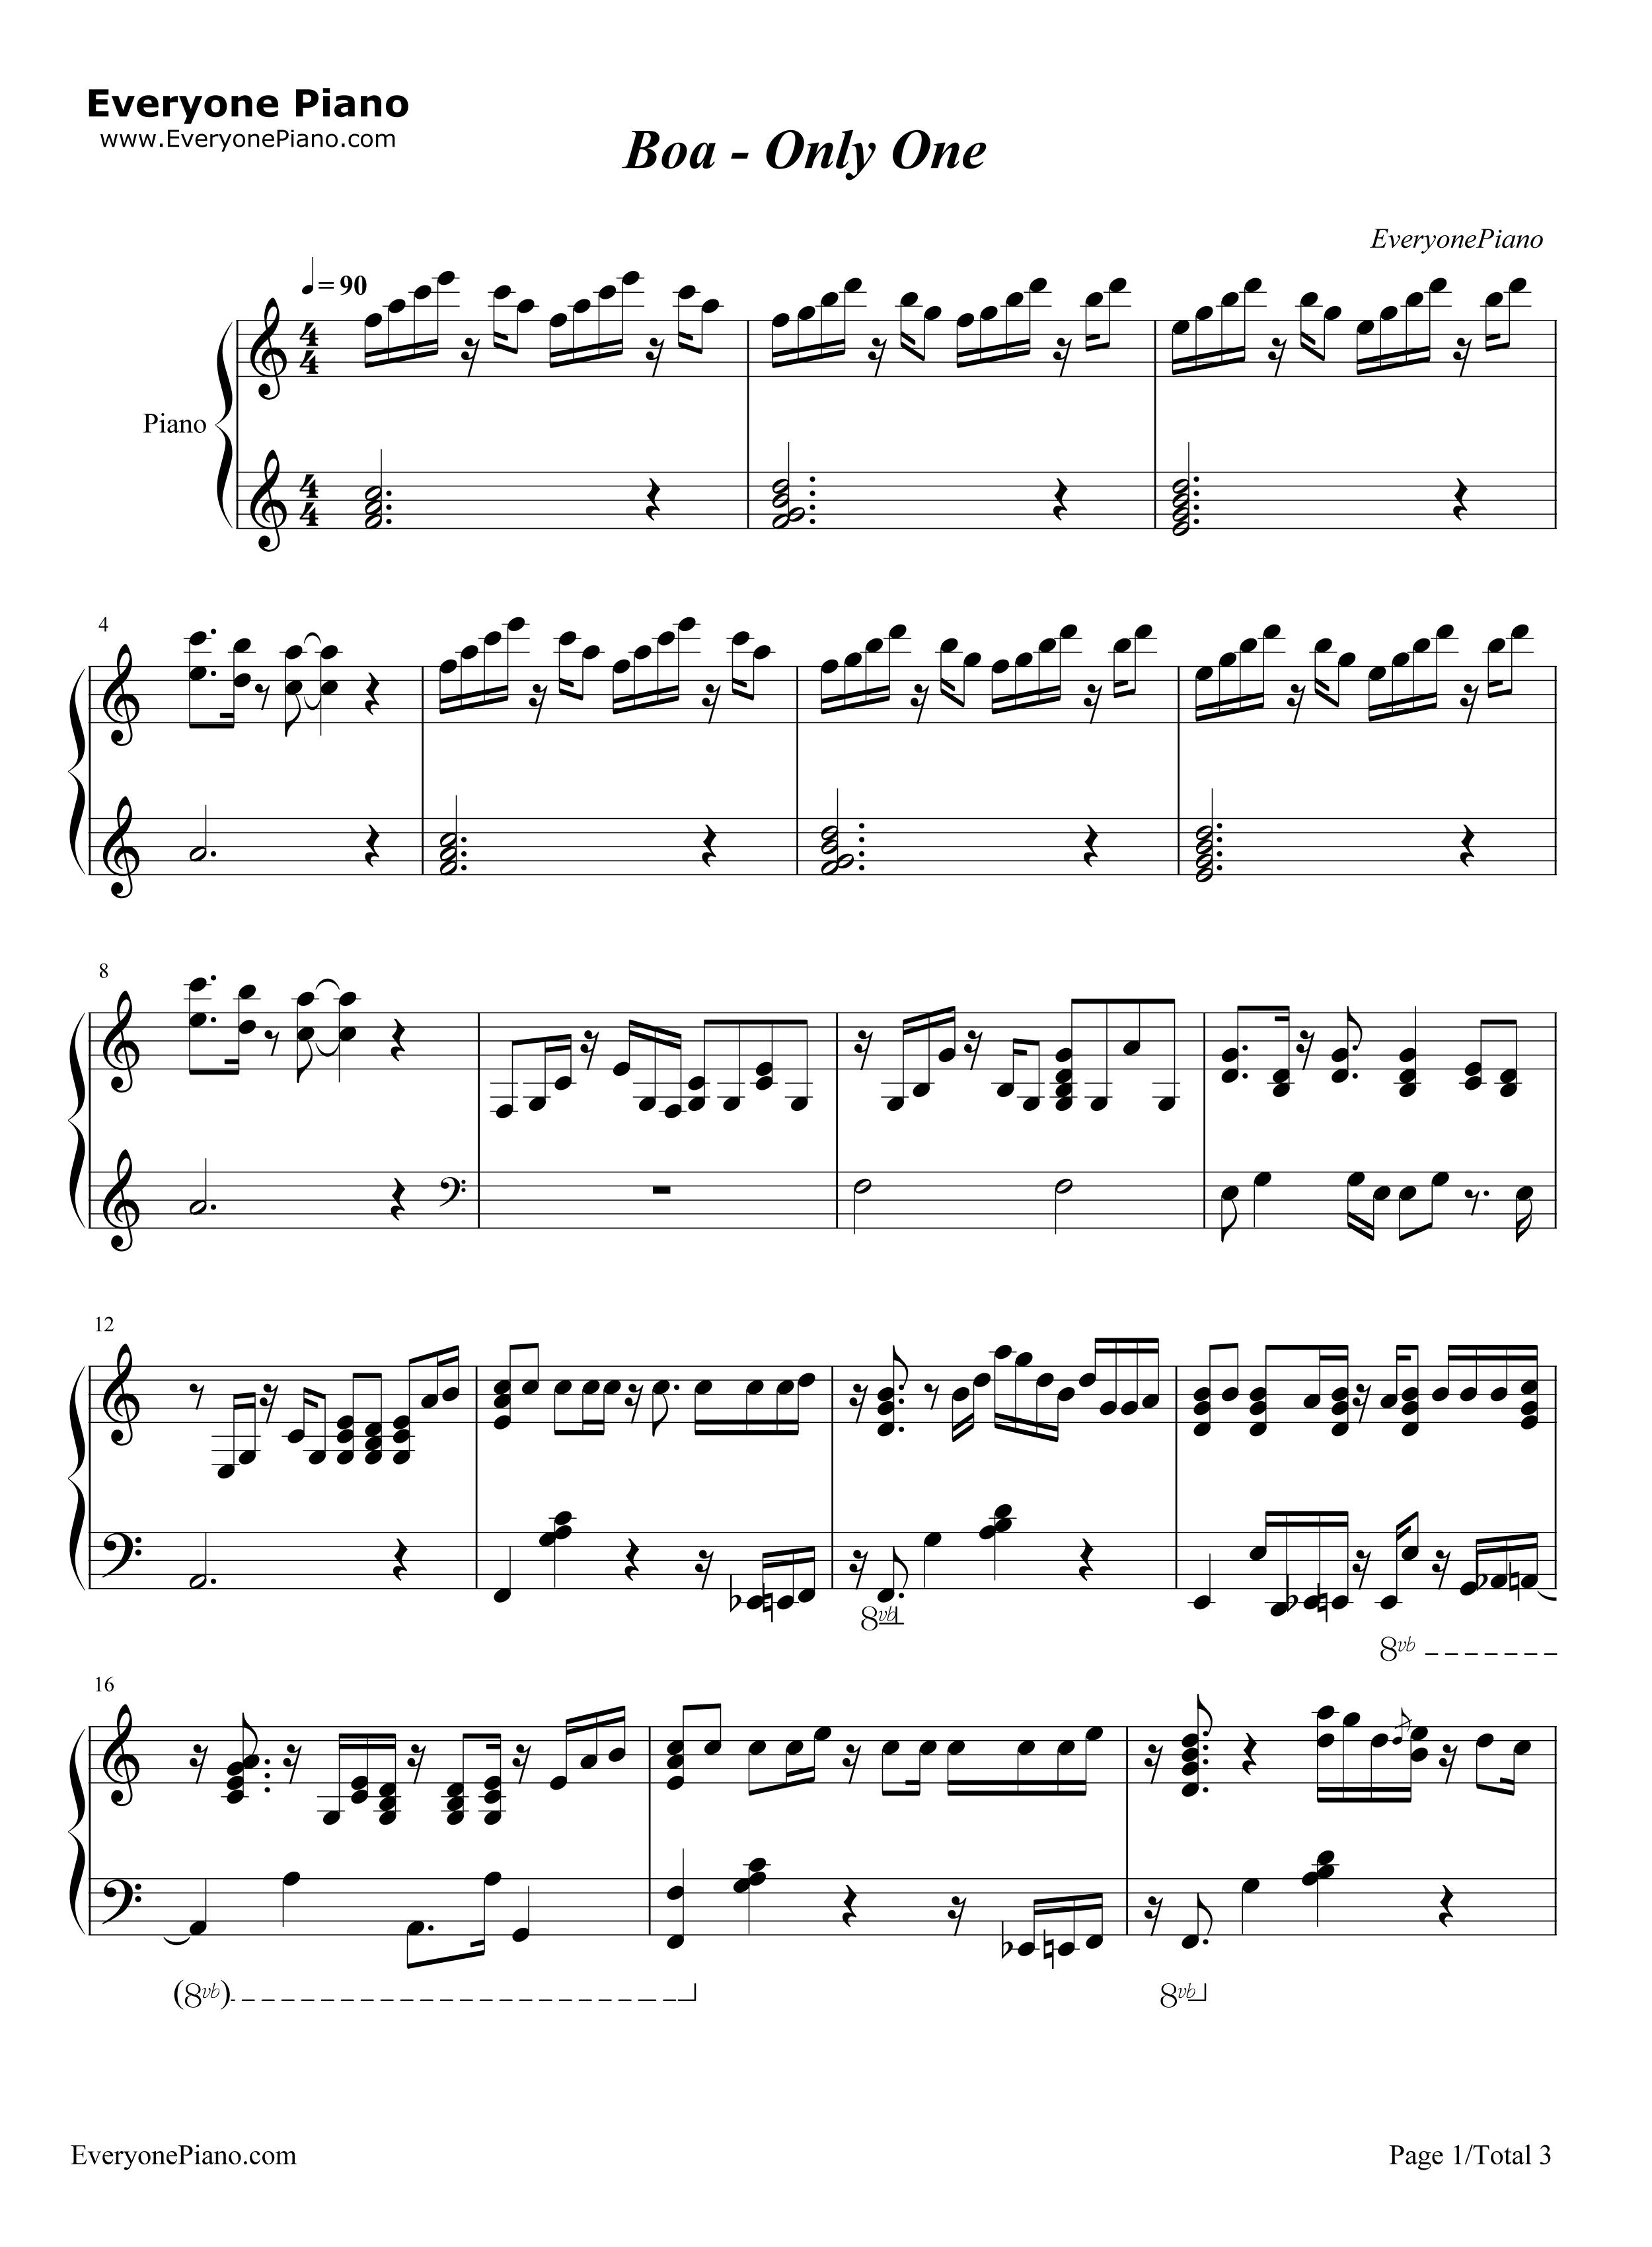 only one - boa五线谱预览1-钢琴谱